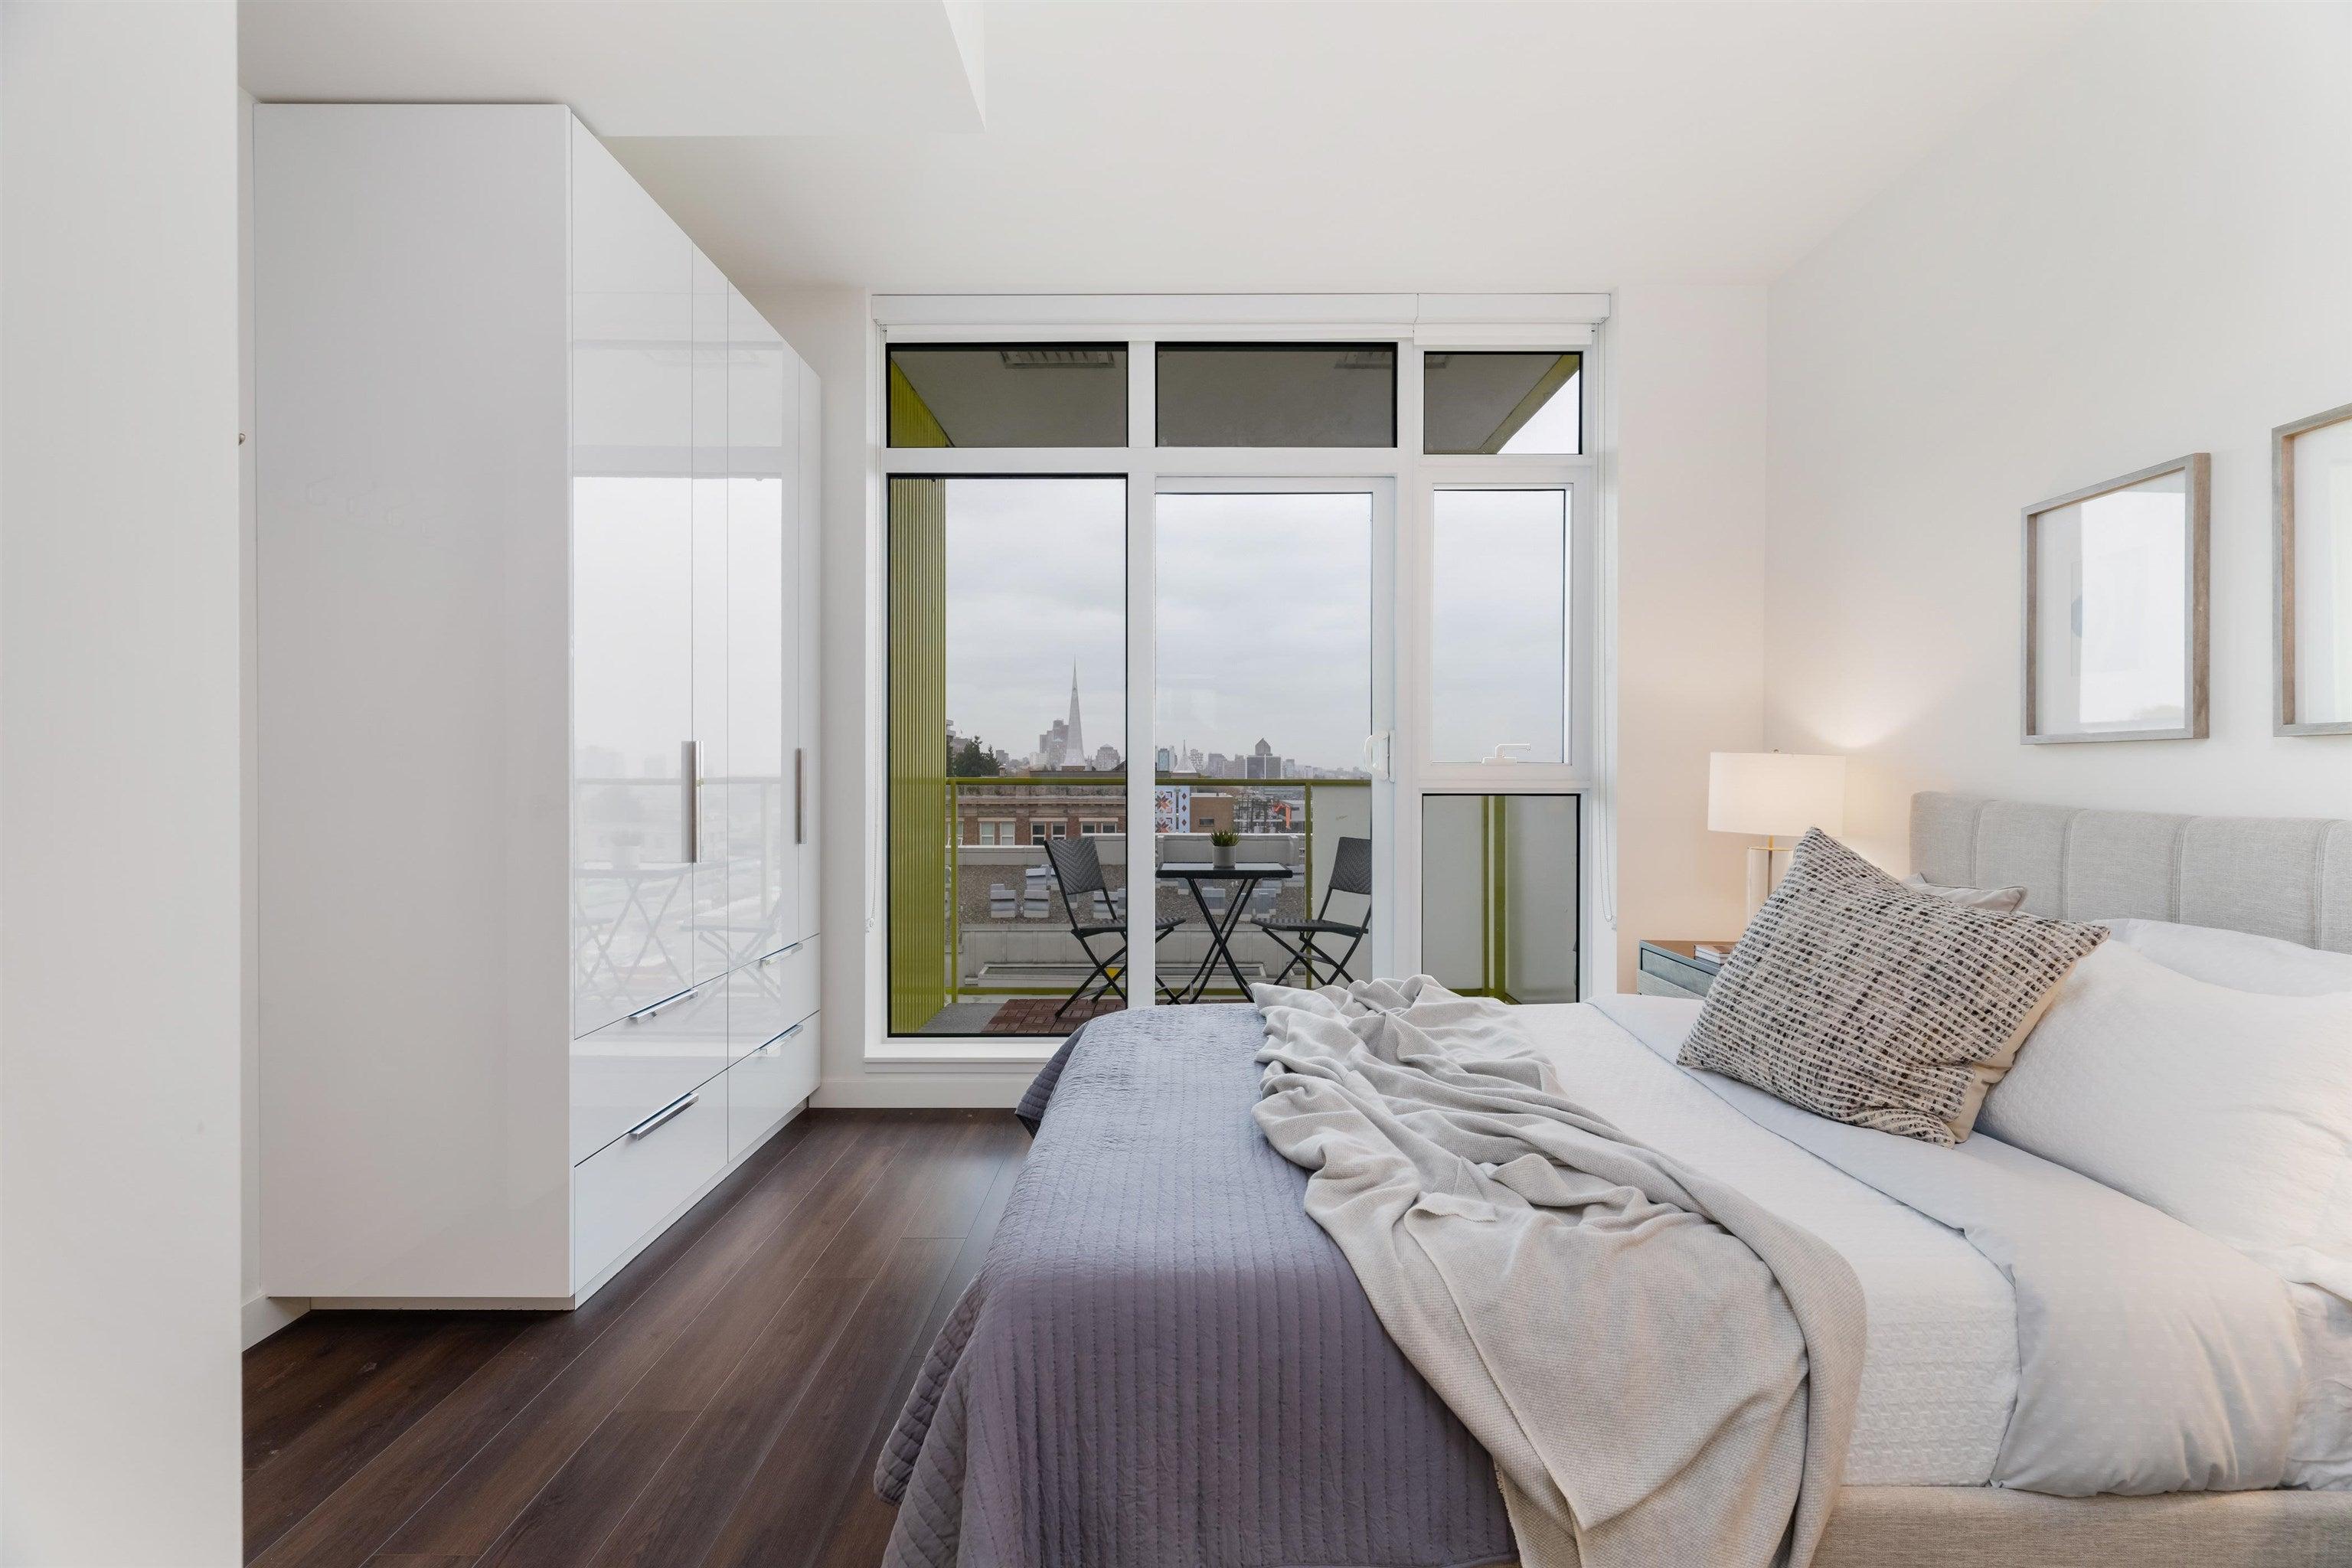 523 2508 WATSON STREET - Mount Pleasant VE Townhouse for sale, 3 Bedrooms (R2625701) - #17